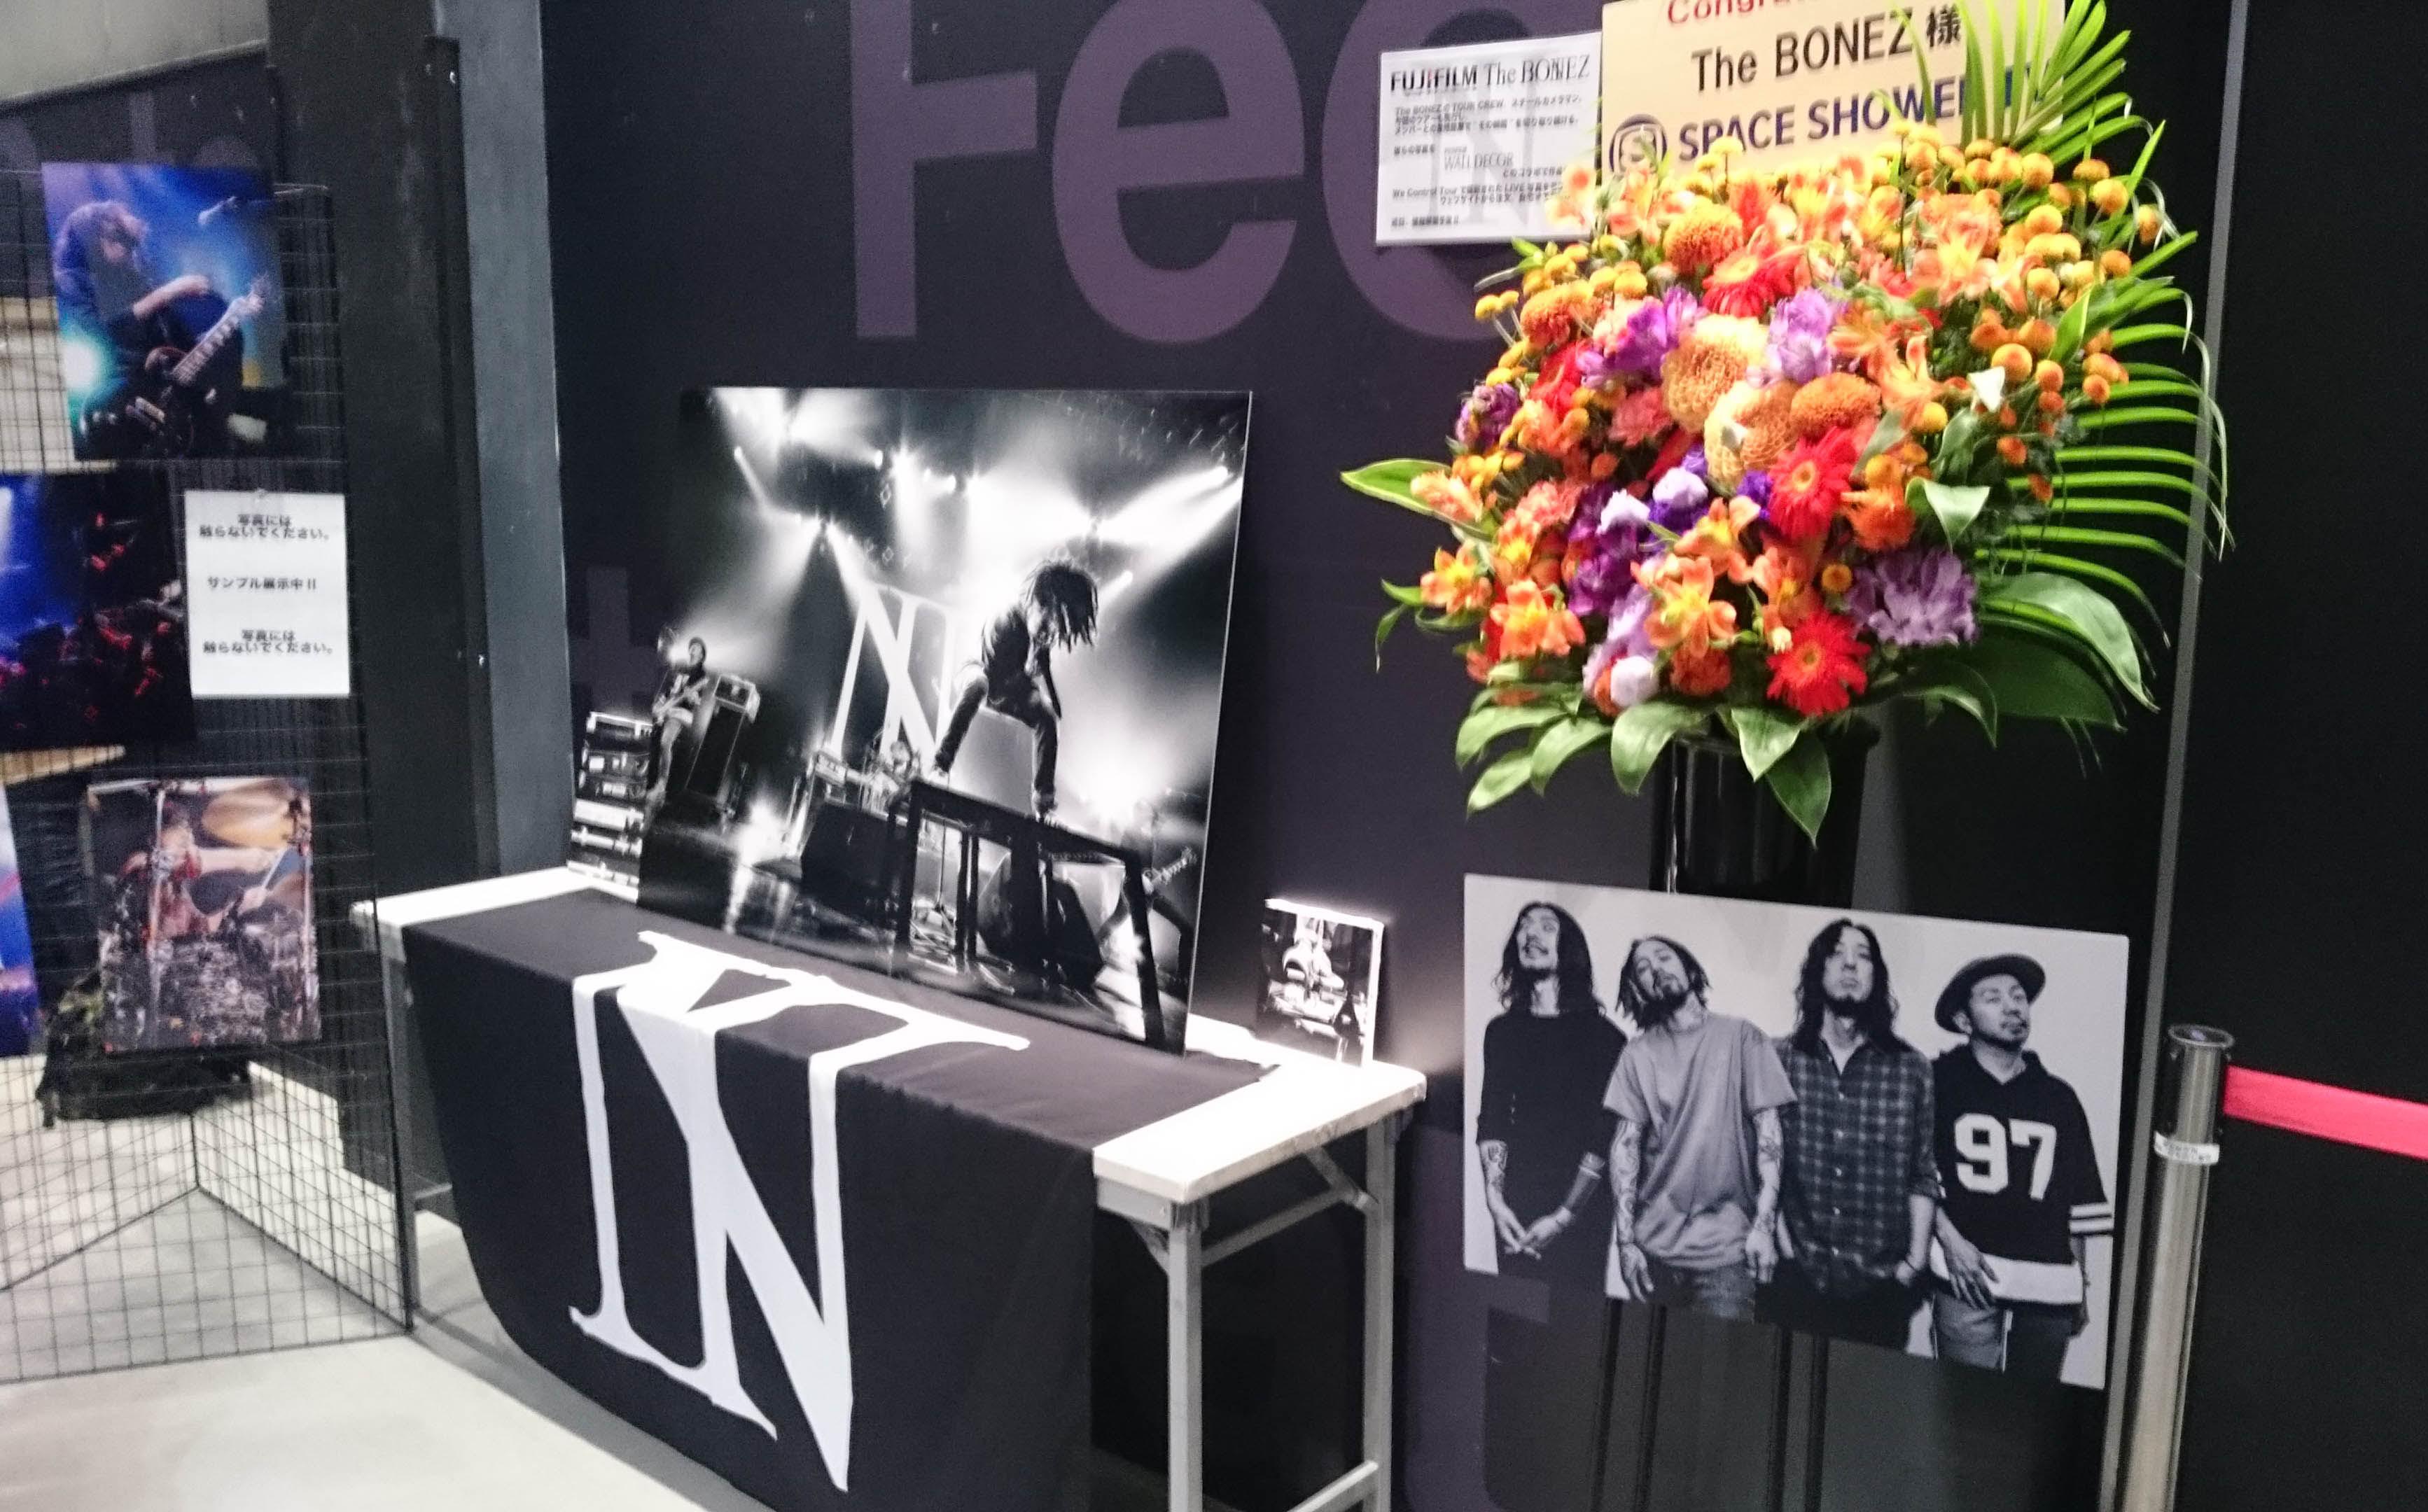 【The BONEZ】We Control -Zepp Tour 2019@Zepp DiverCity 追加公演のライブレポ